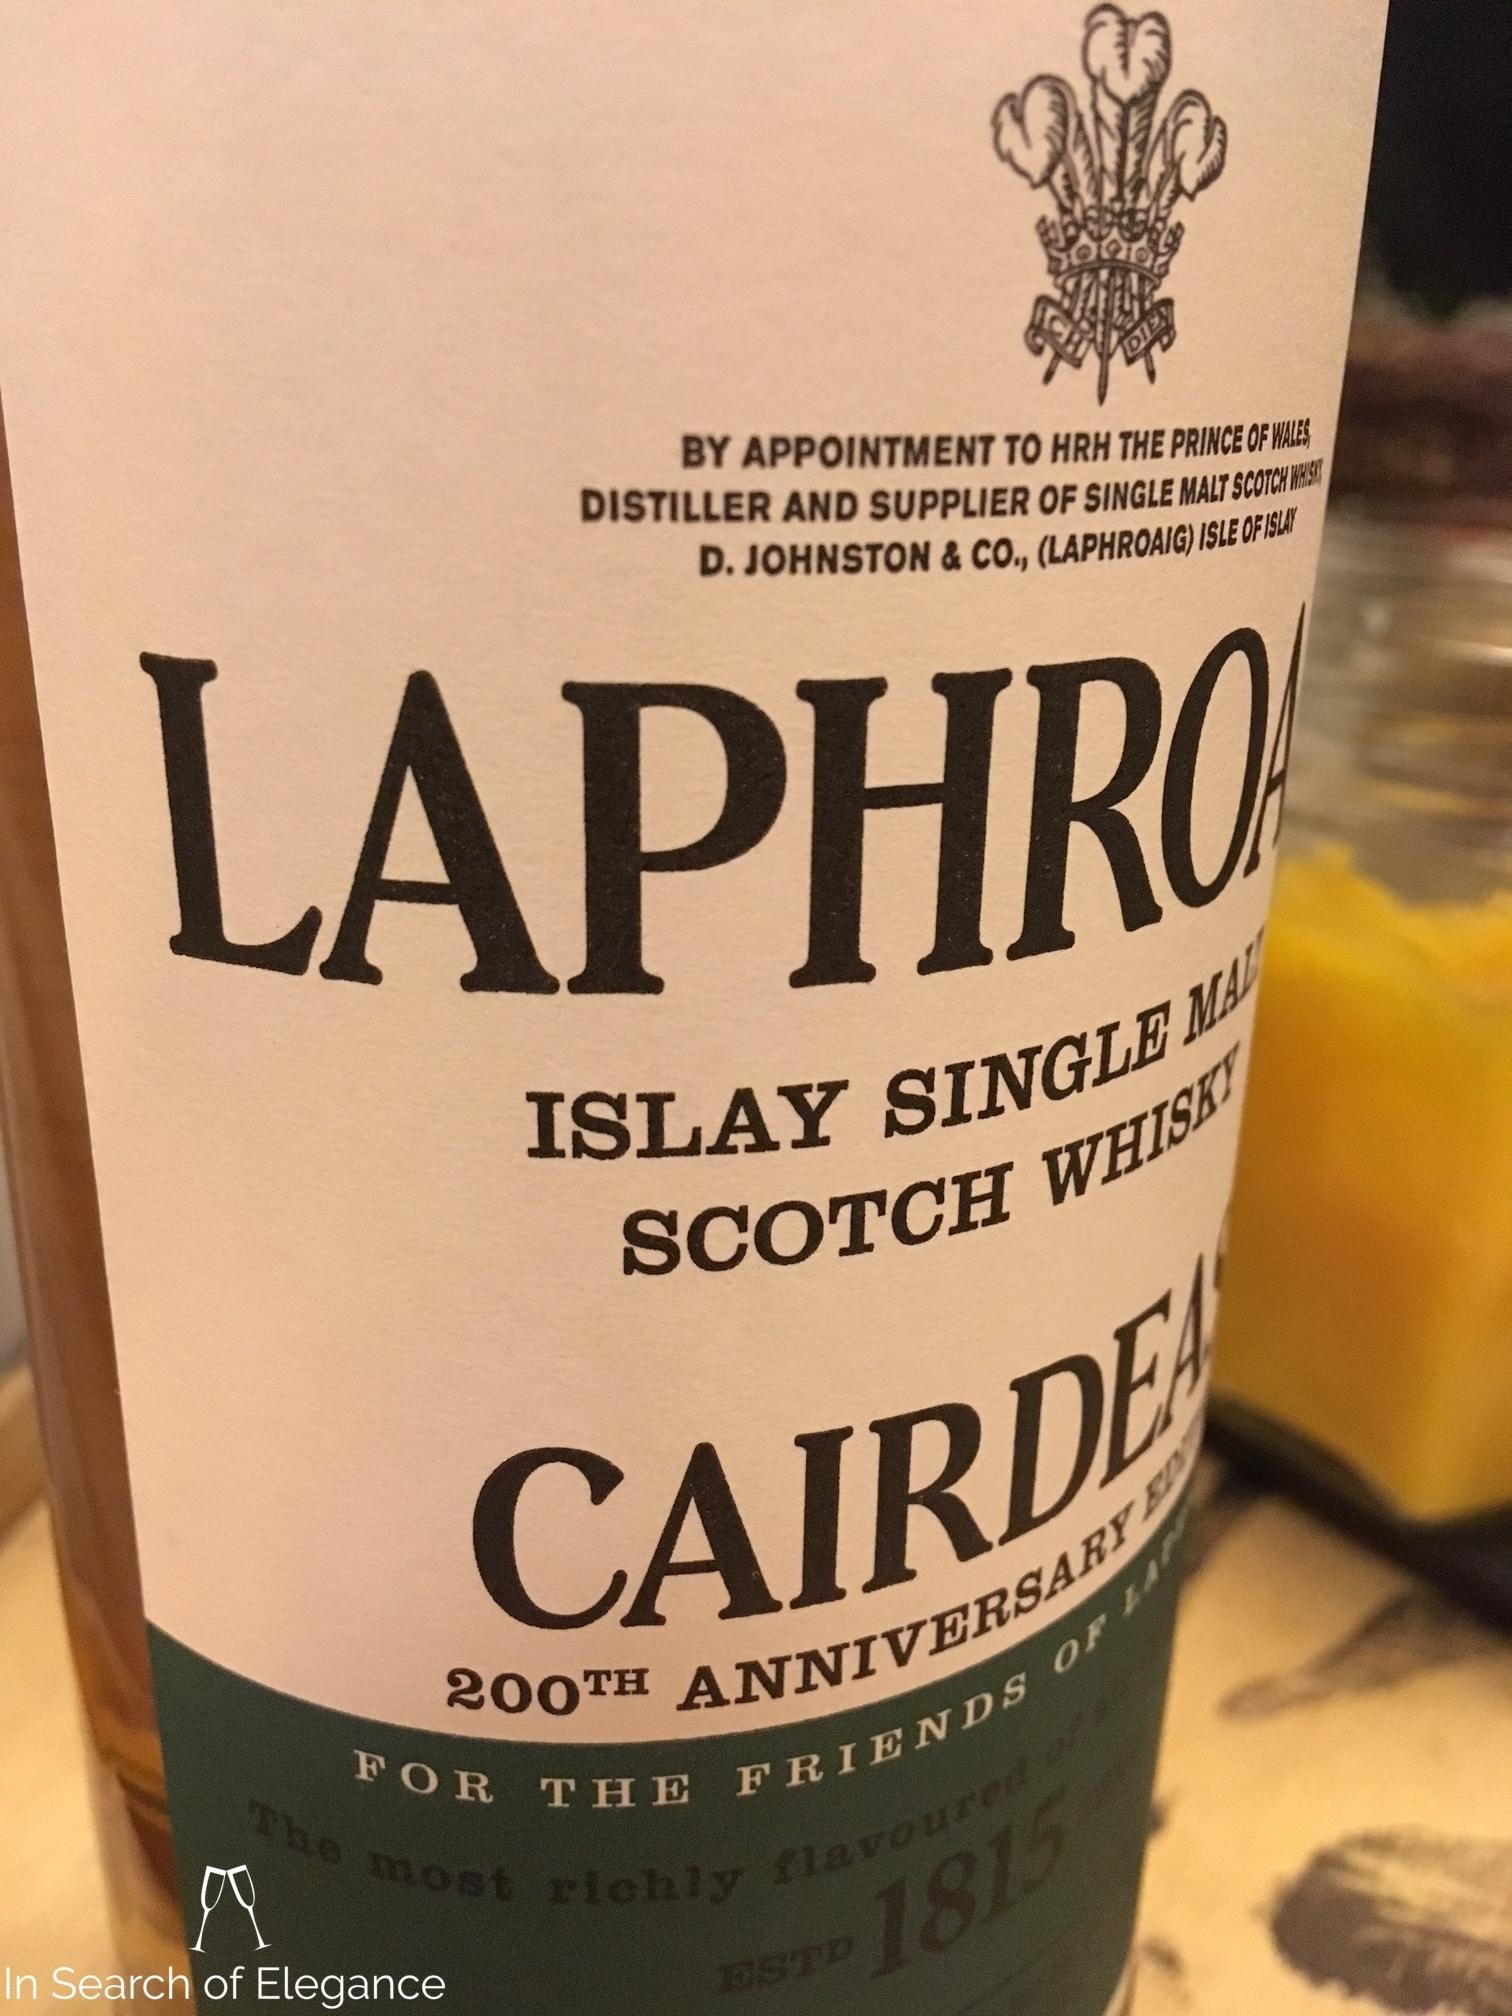 Laphroaig Cairdeas 200.jpg